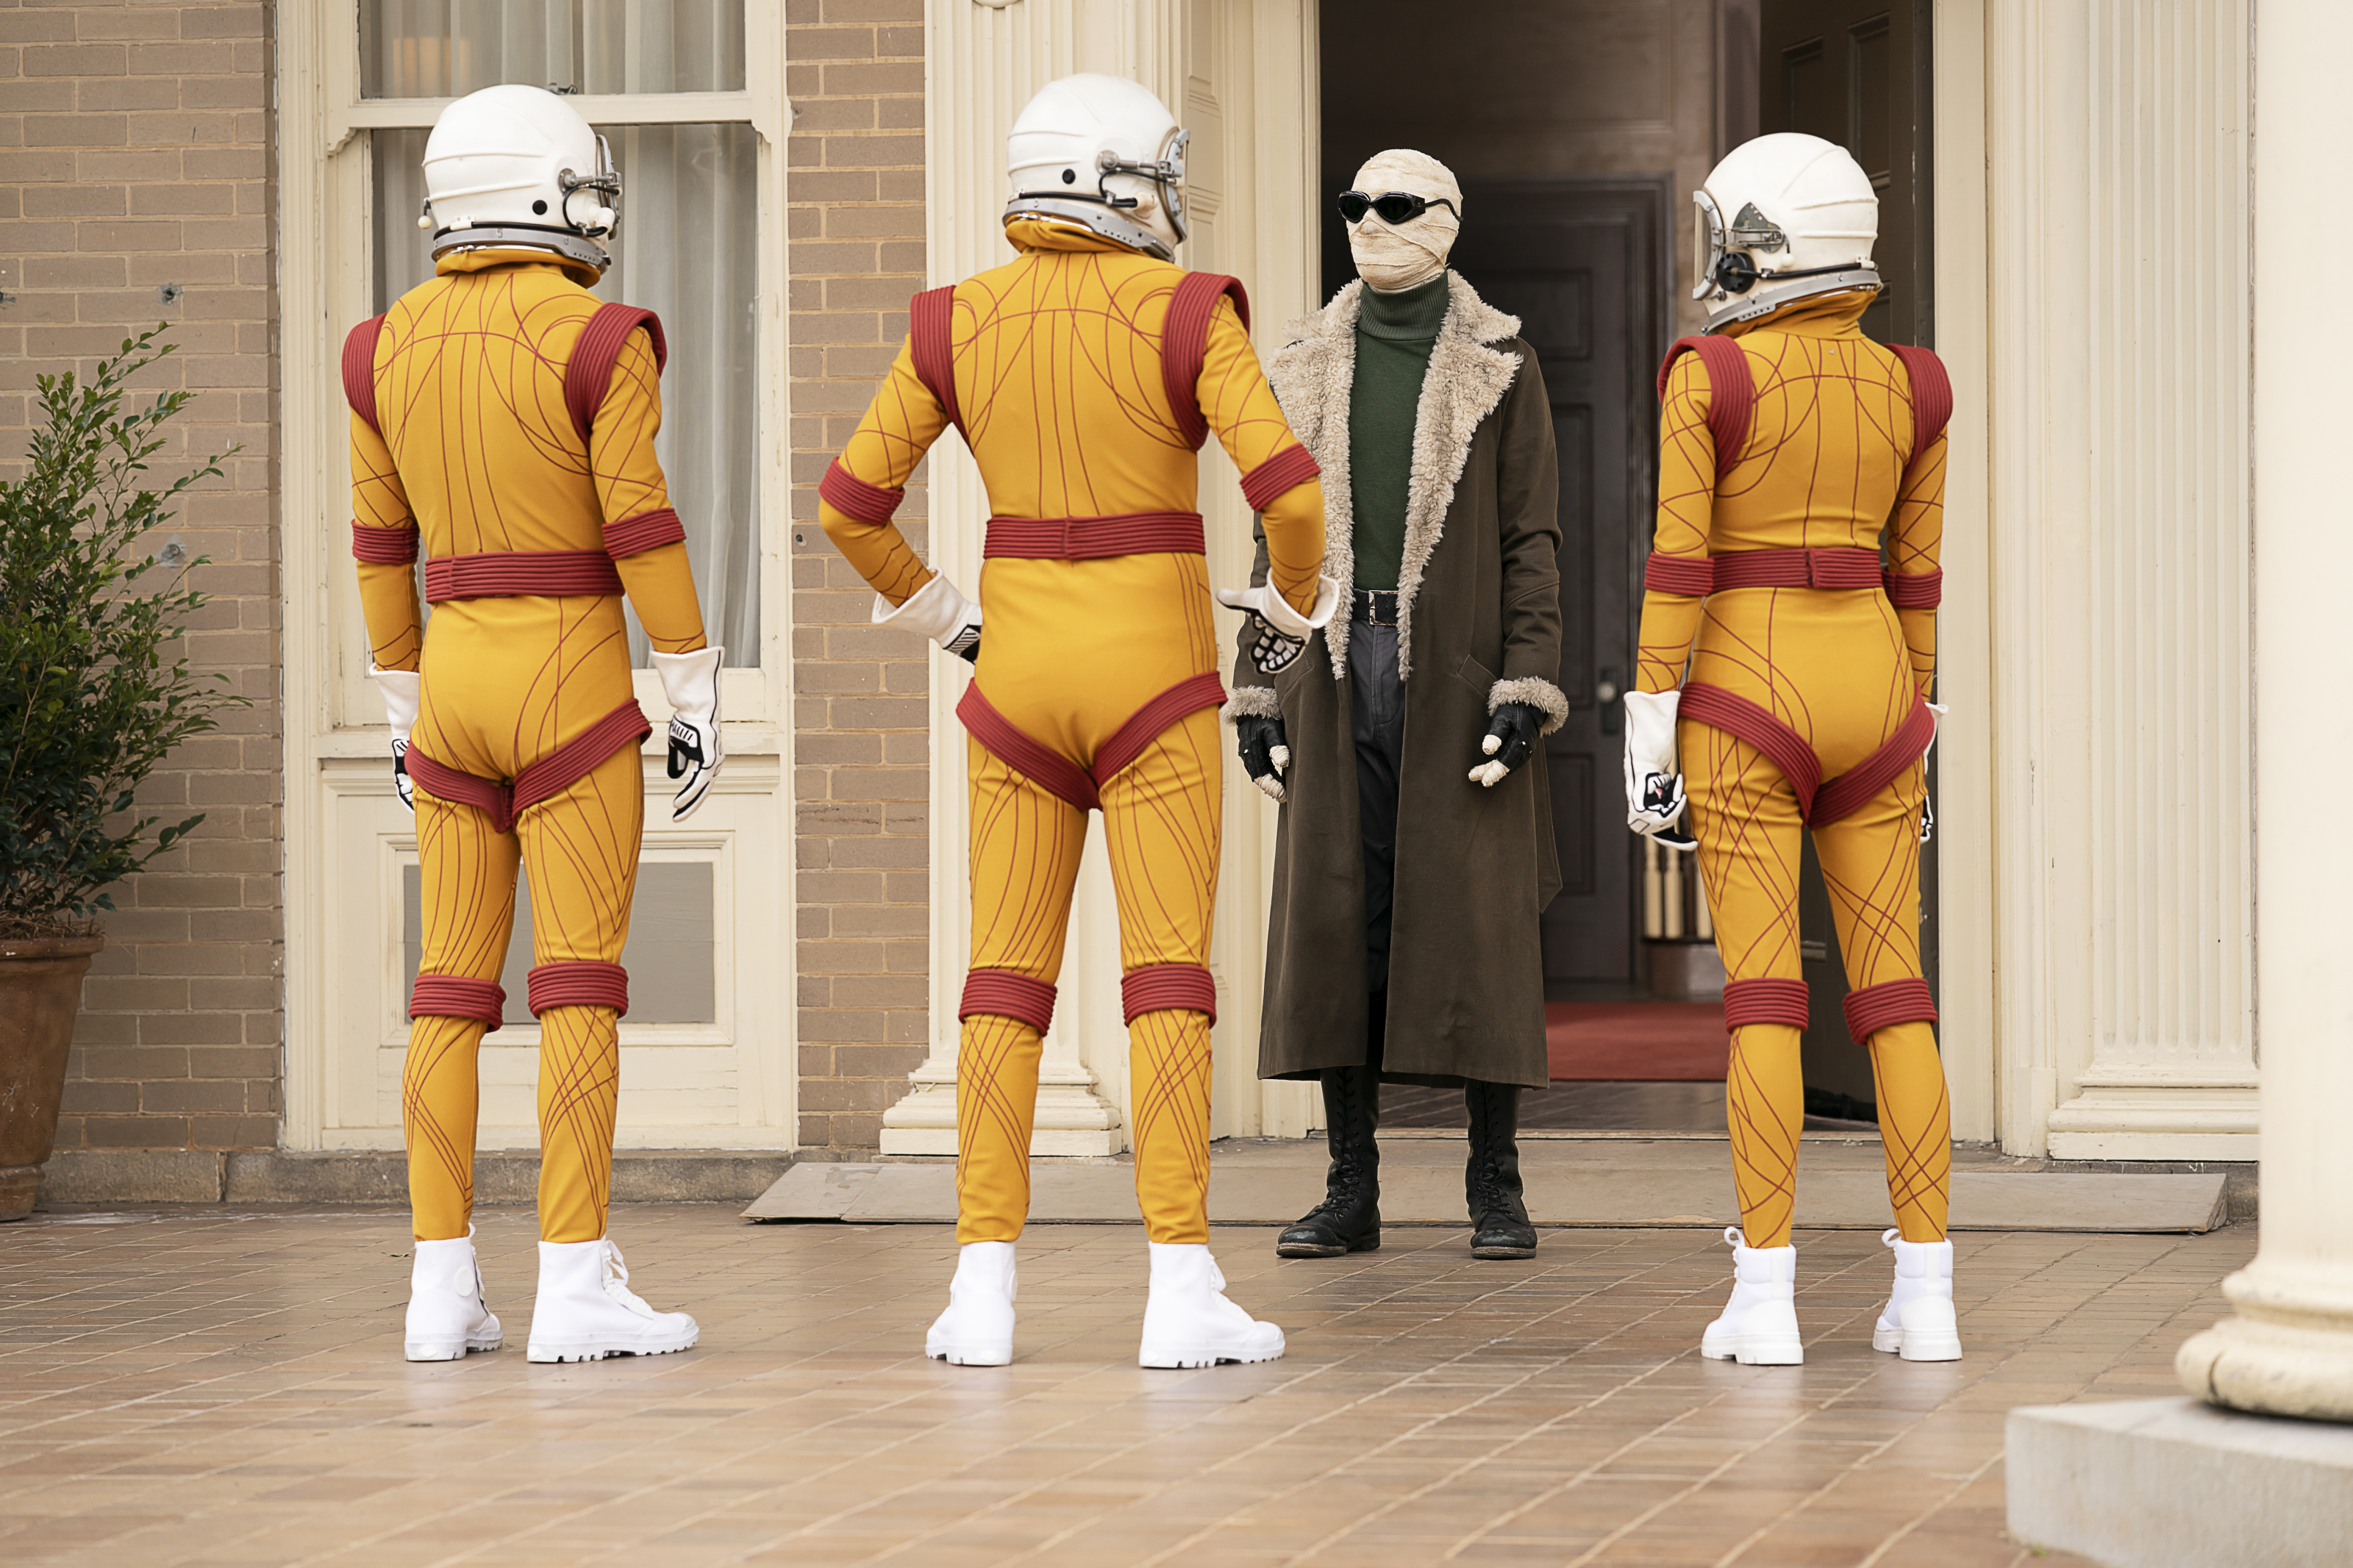 Review Doom Patrol Season 2 Episode 6 Space Patrol